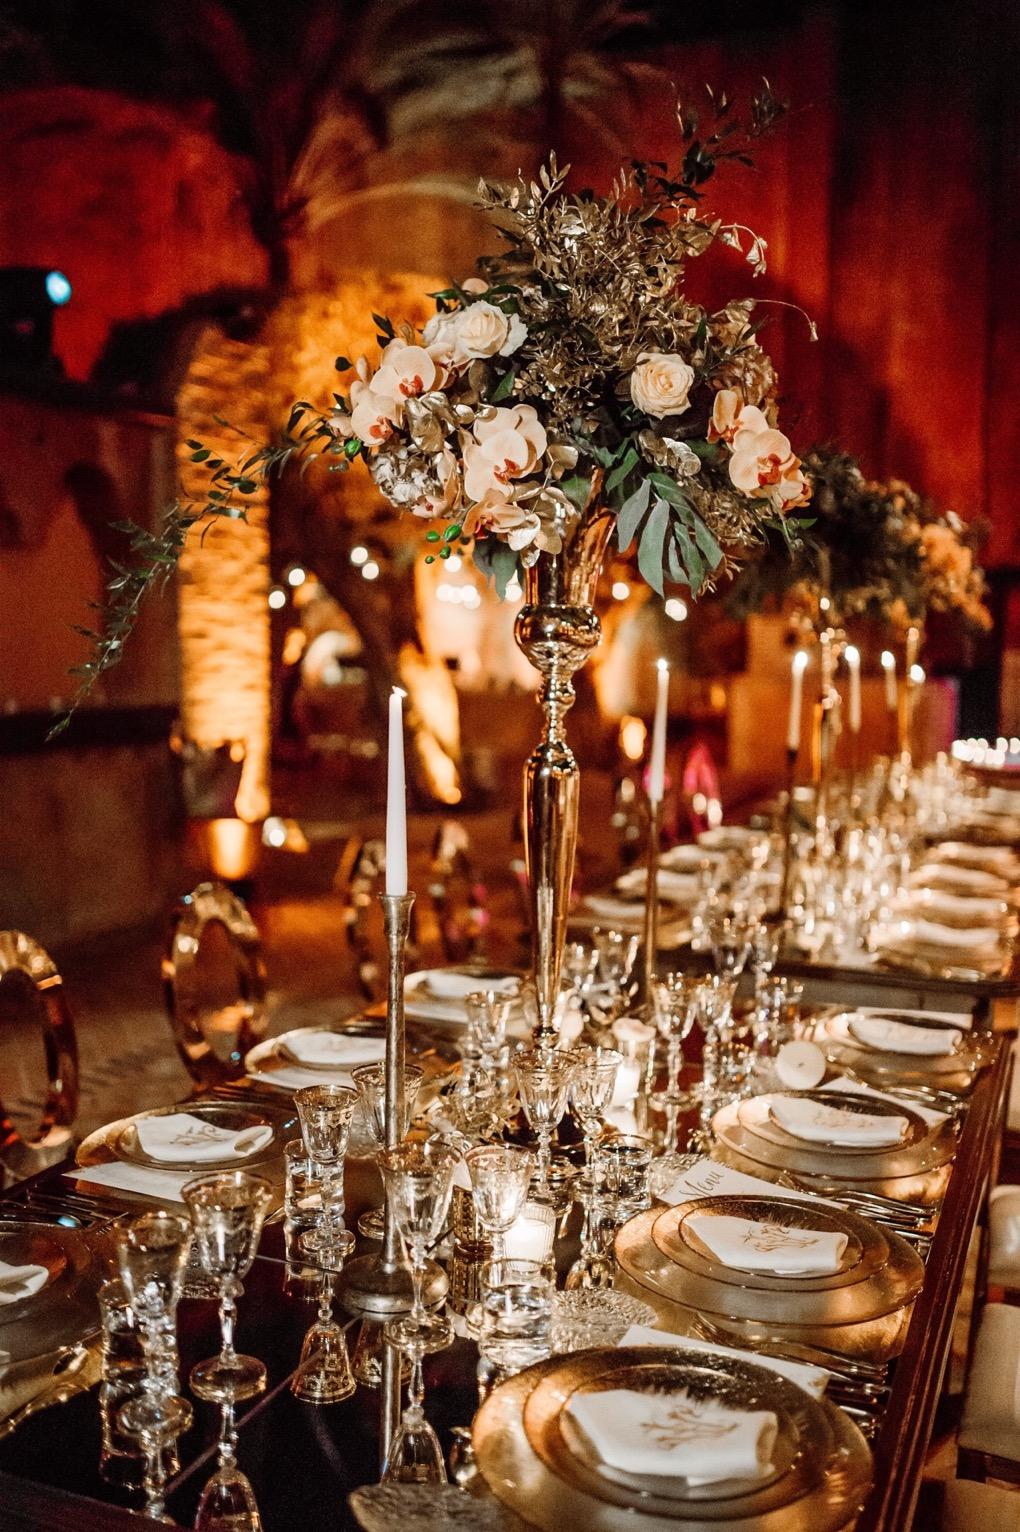 Si-Quiero-Wedding-Planner-By-Sira-Antequera-Bodas-Málaga-Marbella-Miami- L-A-24